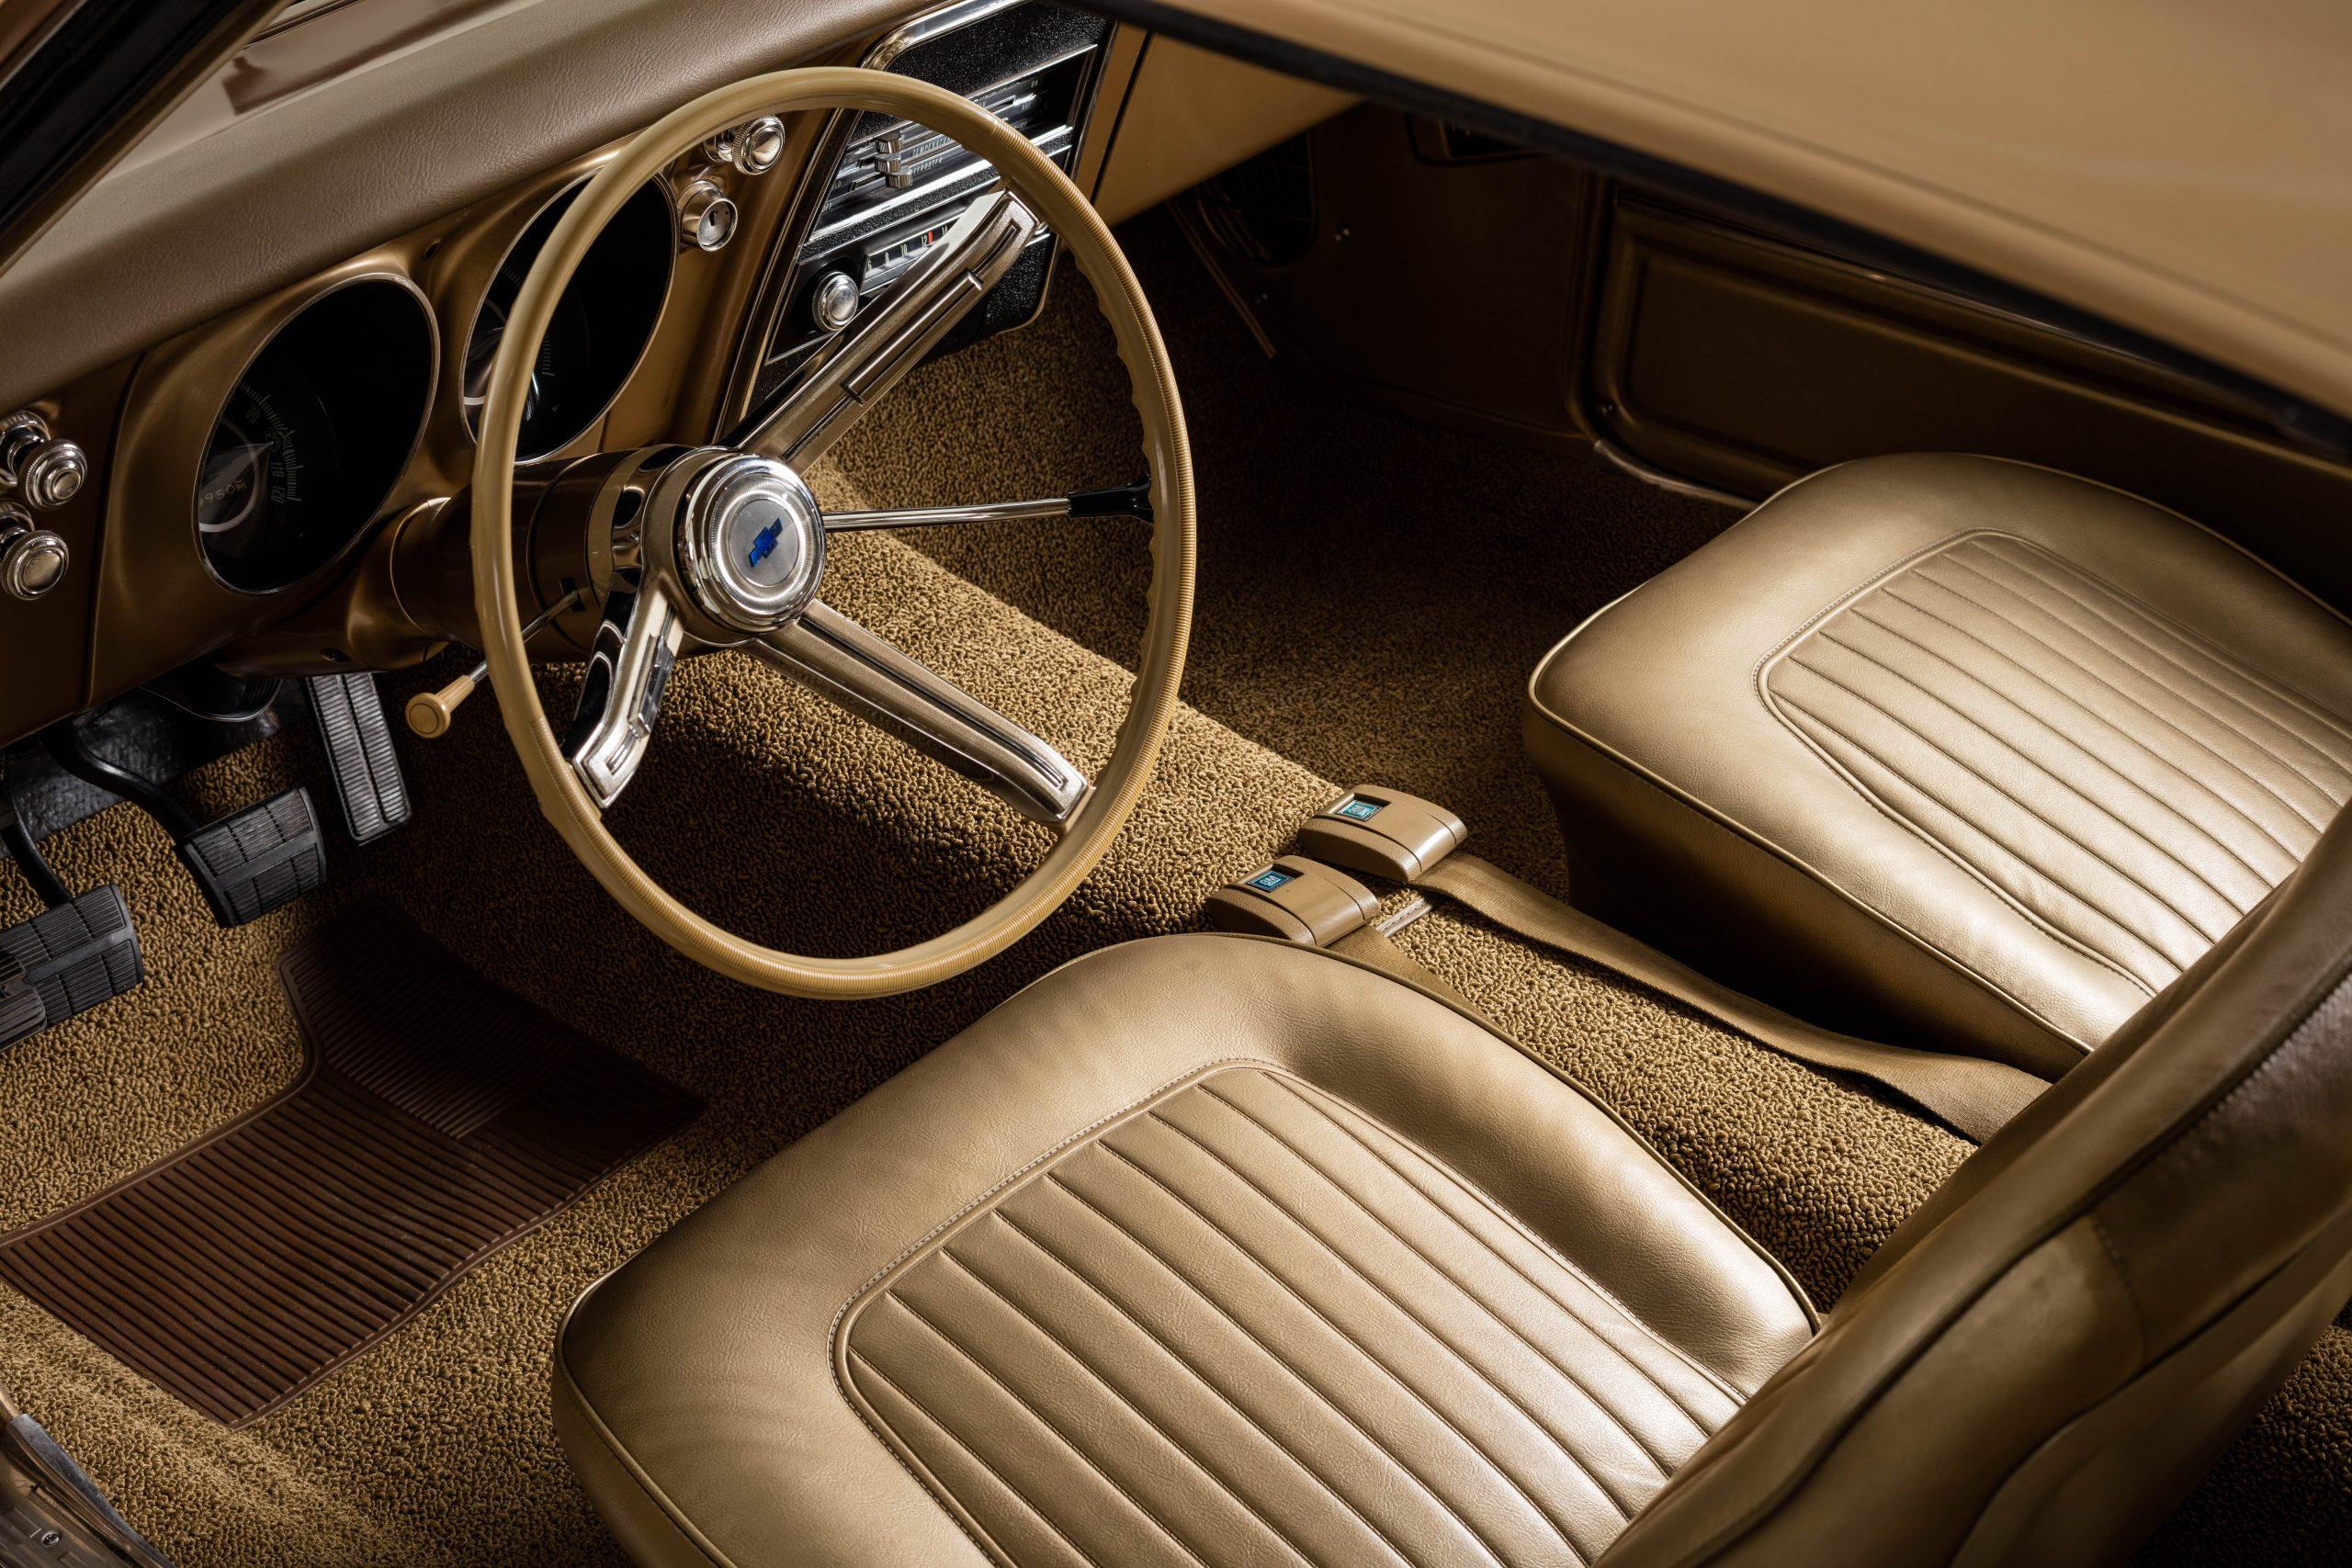 HVA - Chevrolet Camaro N100001 - Interior bucket seats steering wheel